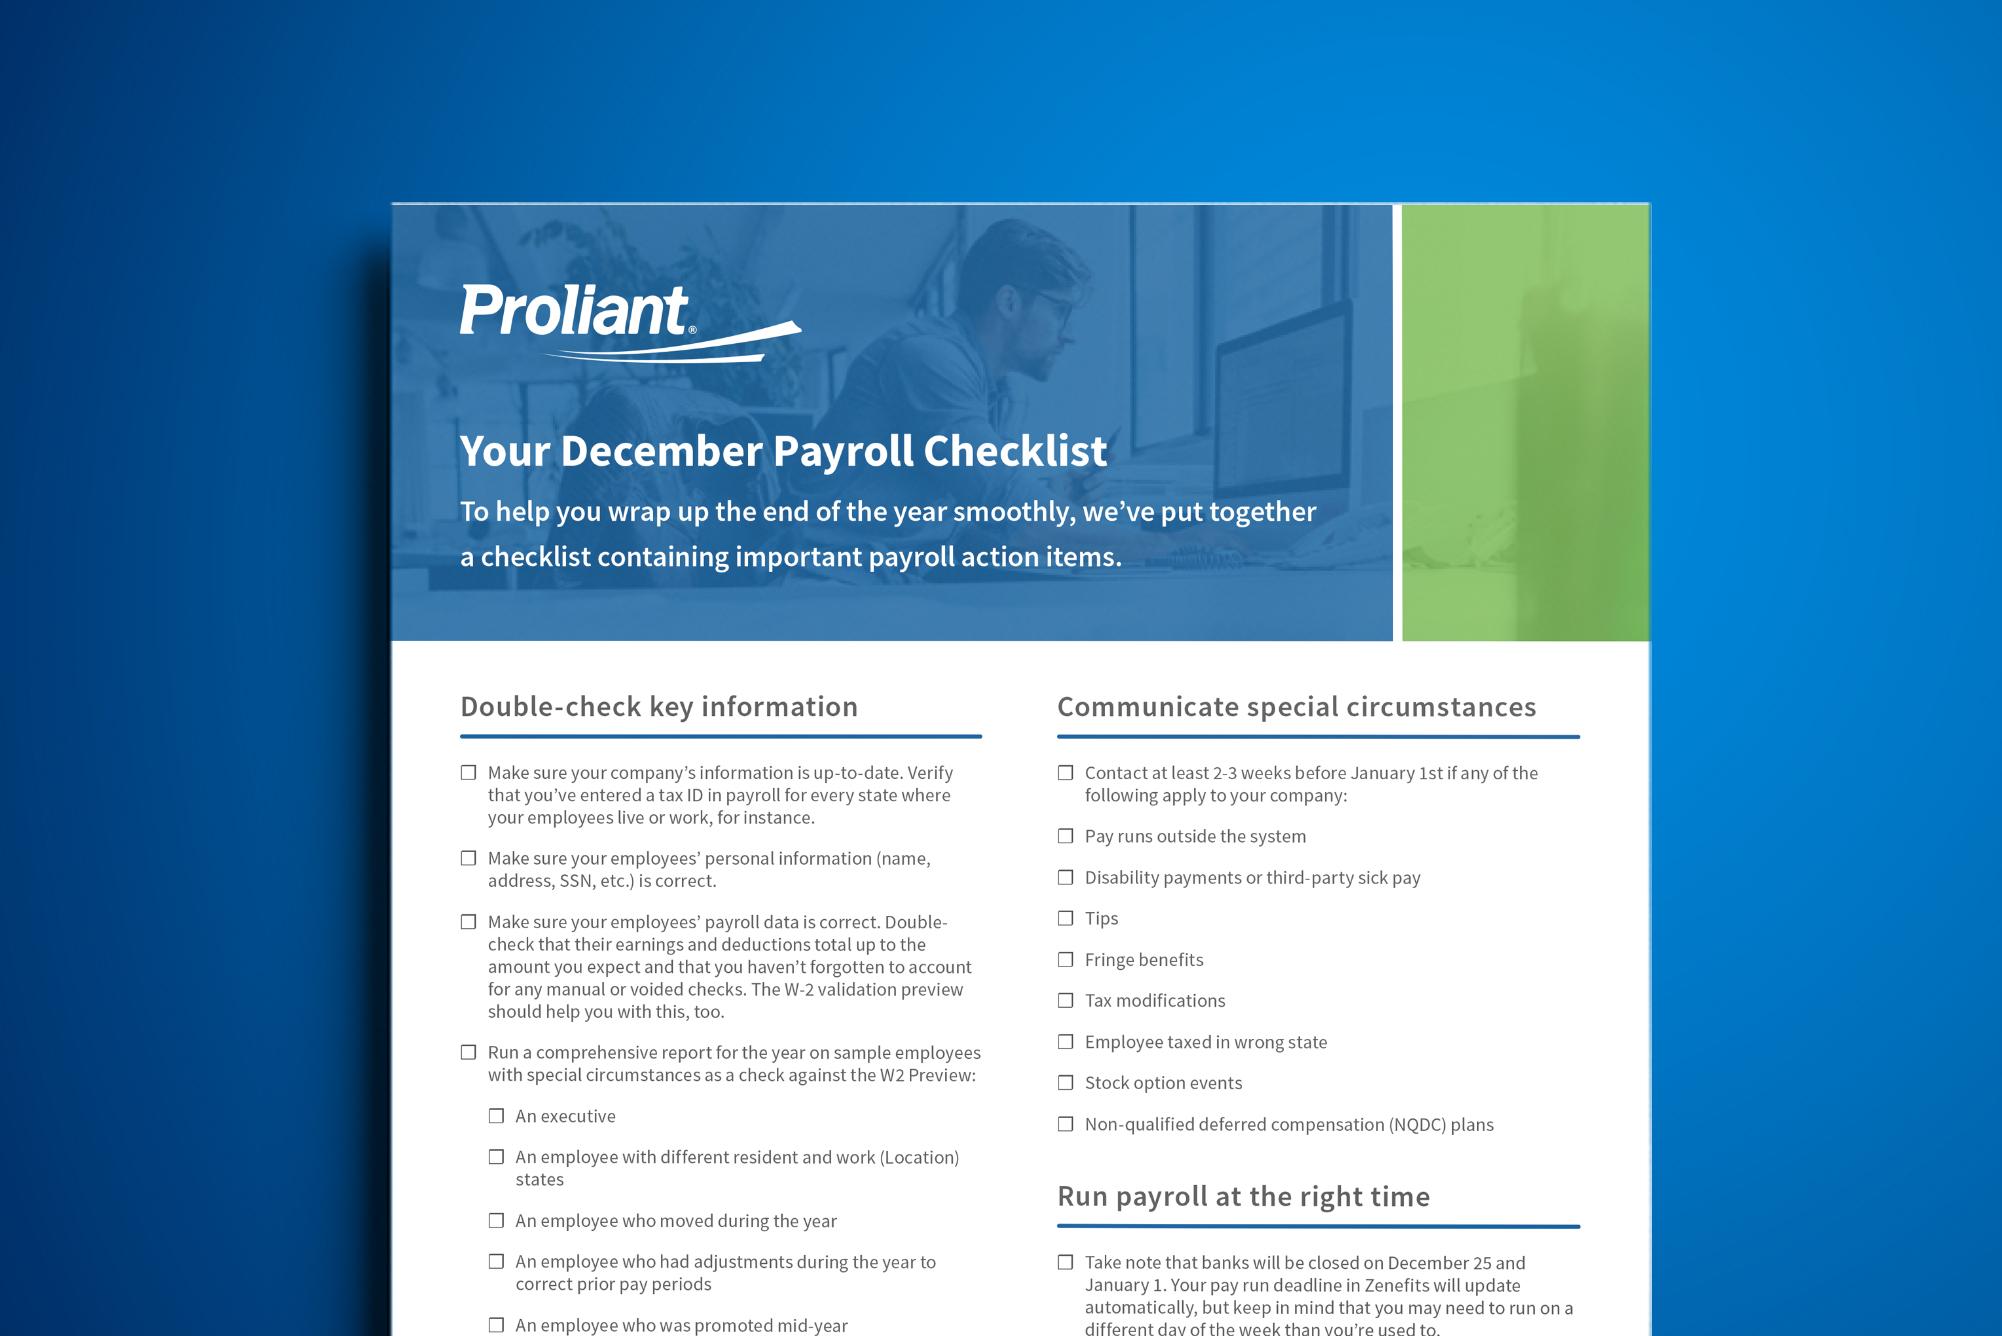 december-payroll-checkilst-mockup-1